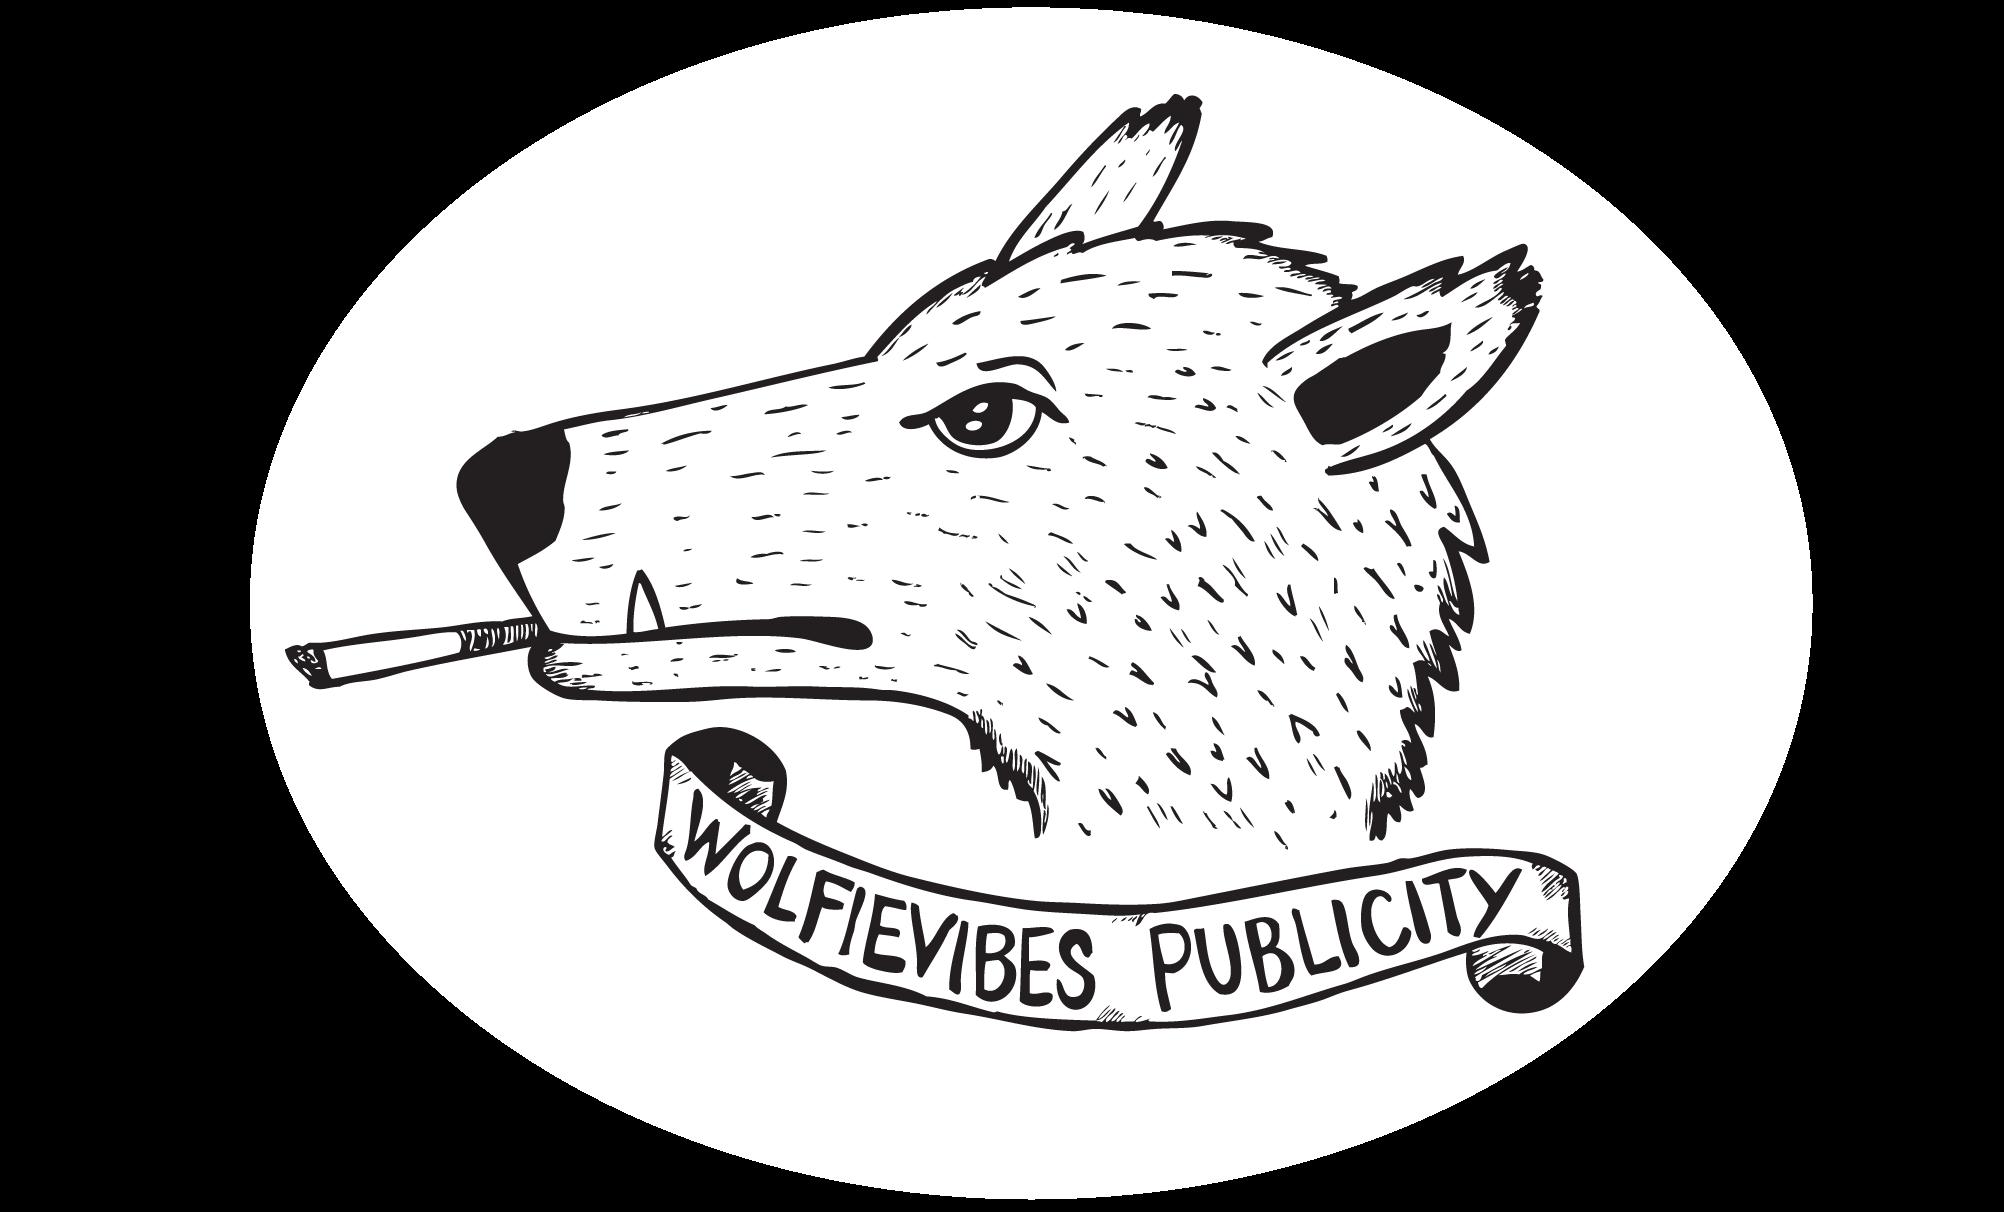 wolfievibeslogo